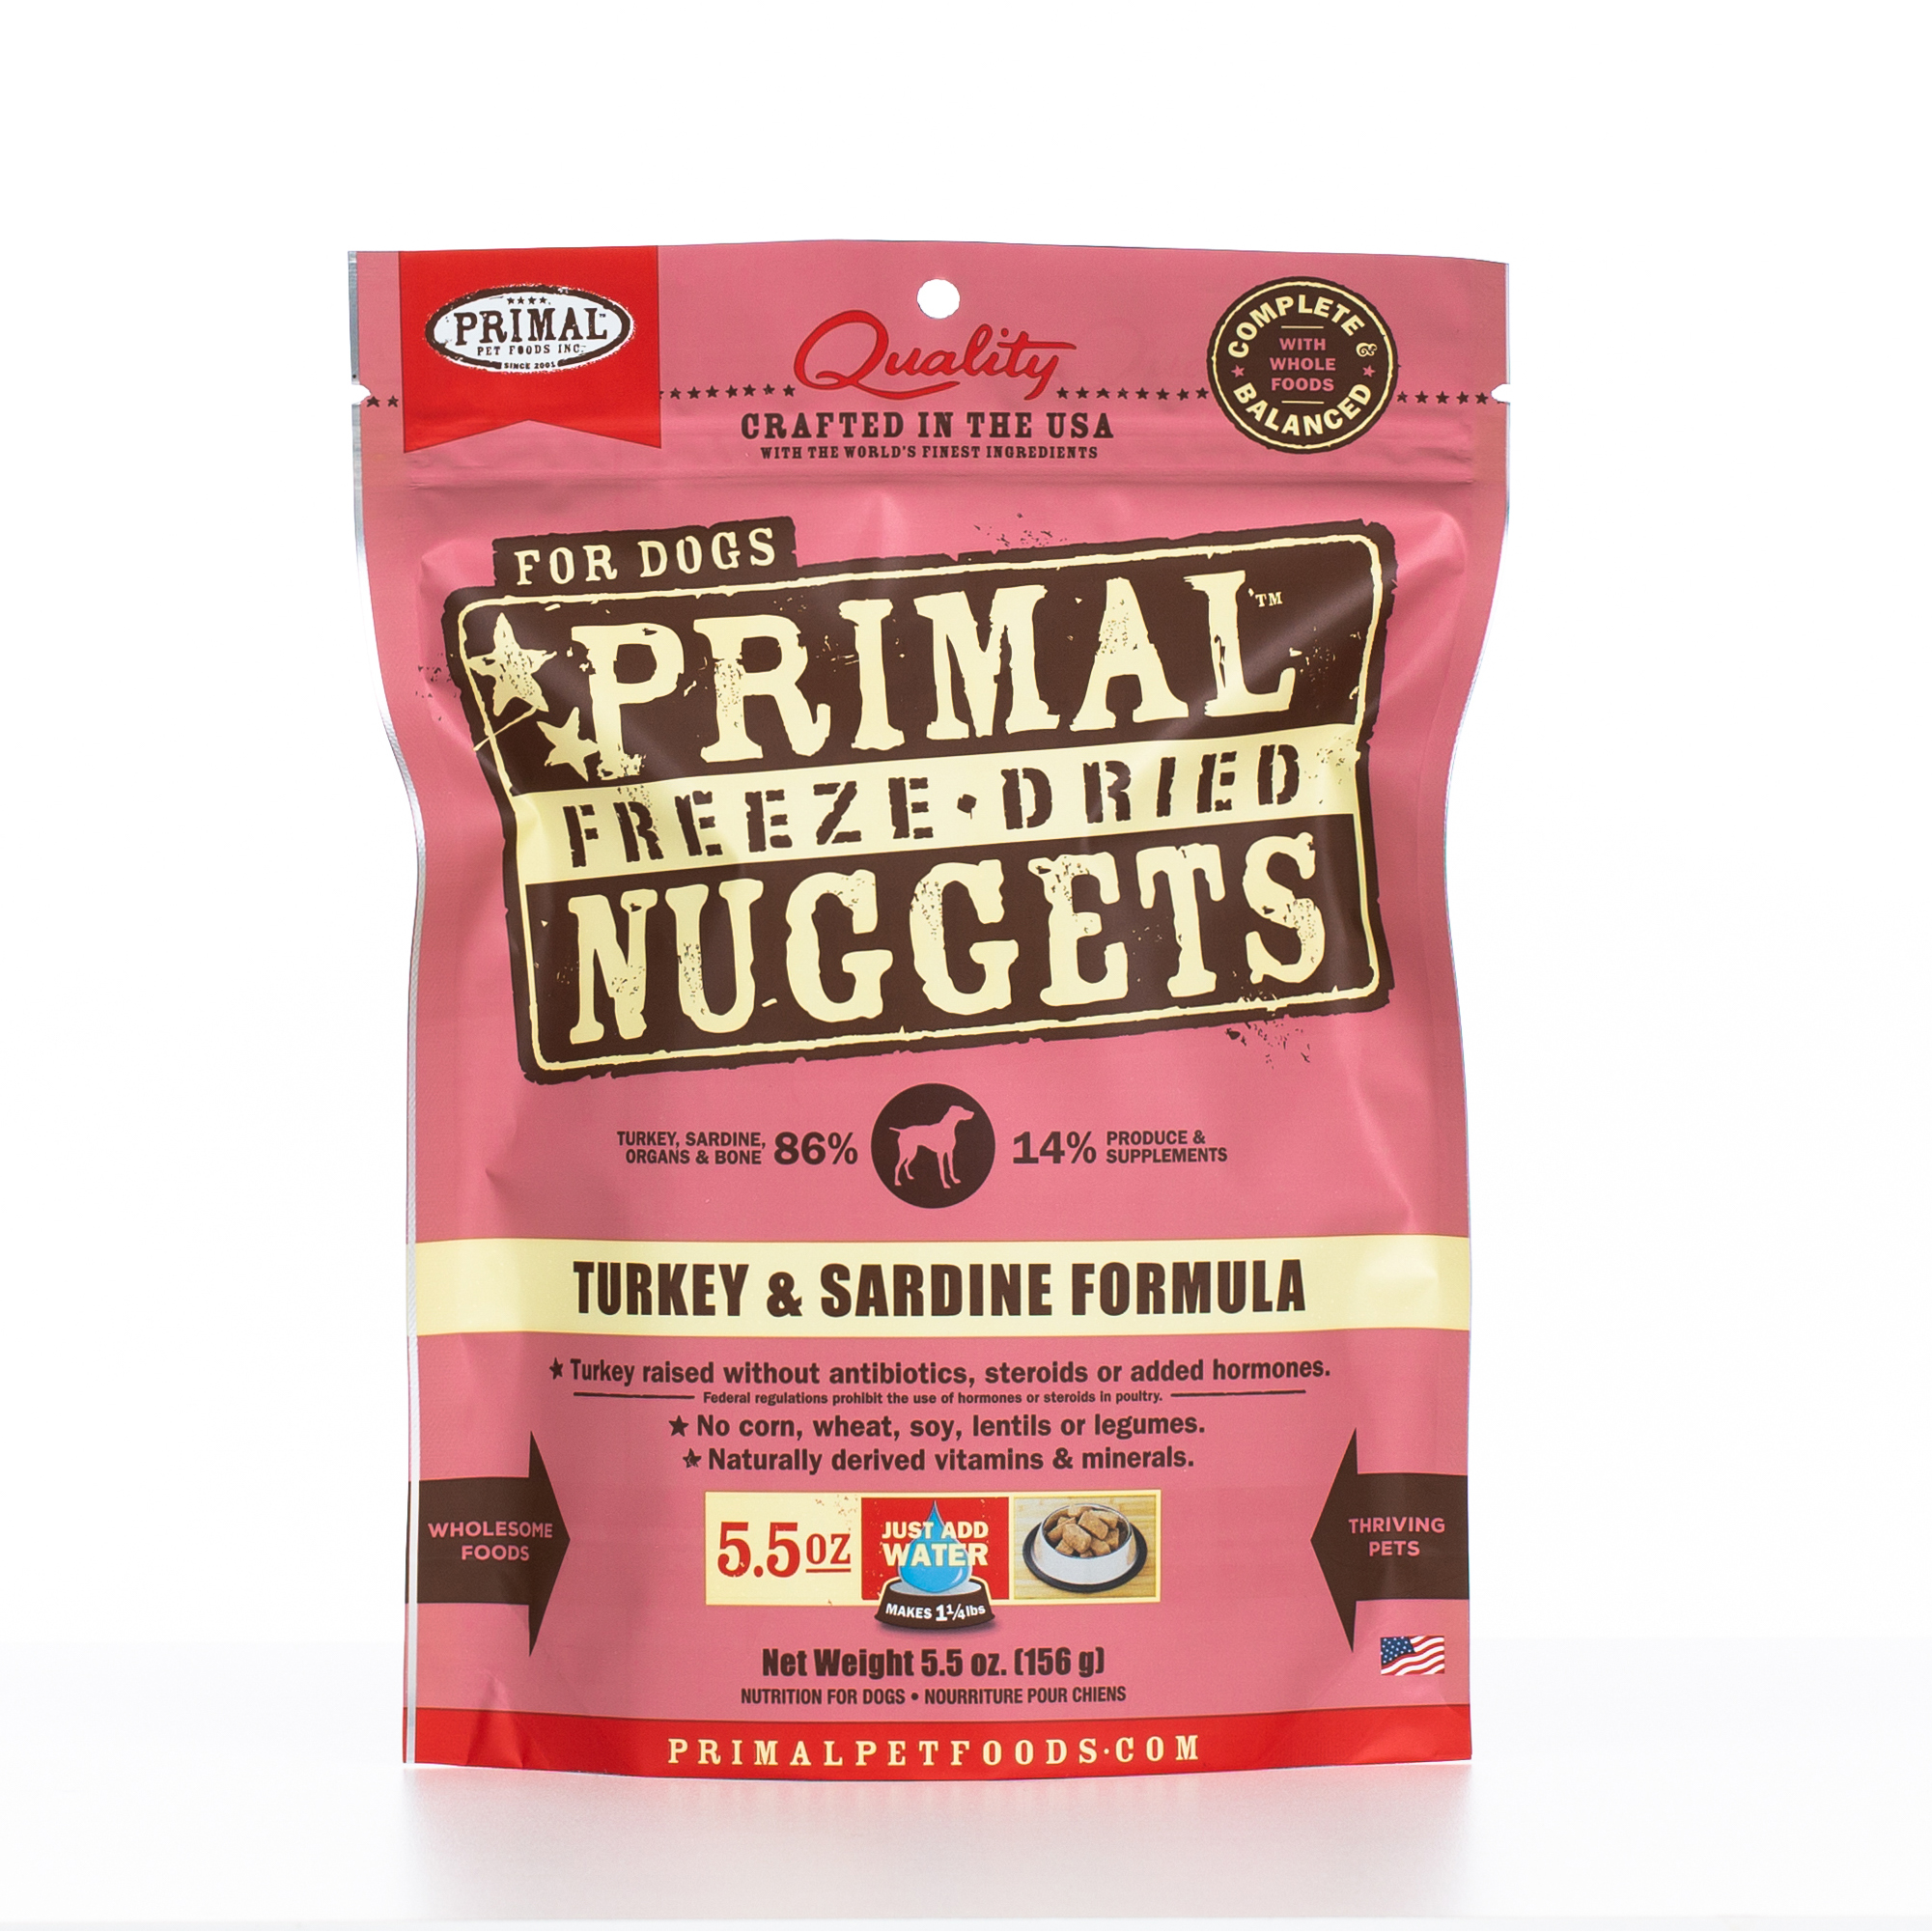 Primal Raw Freeze-Dried Nuggets Turkey & Sardine Formula Dog Food, 5.5-oz bag, case of 8